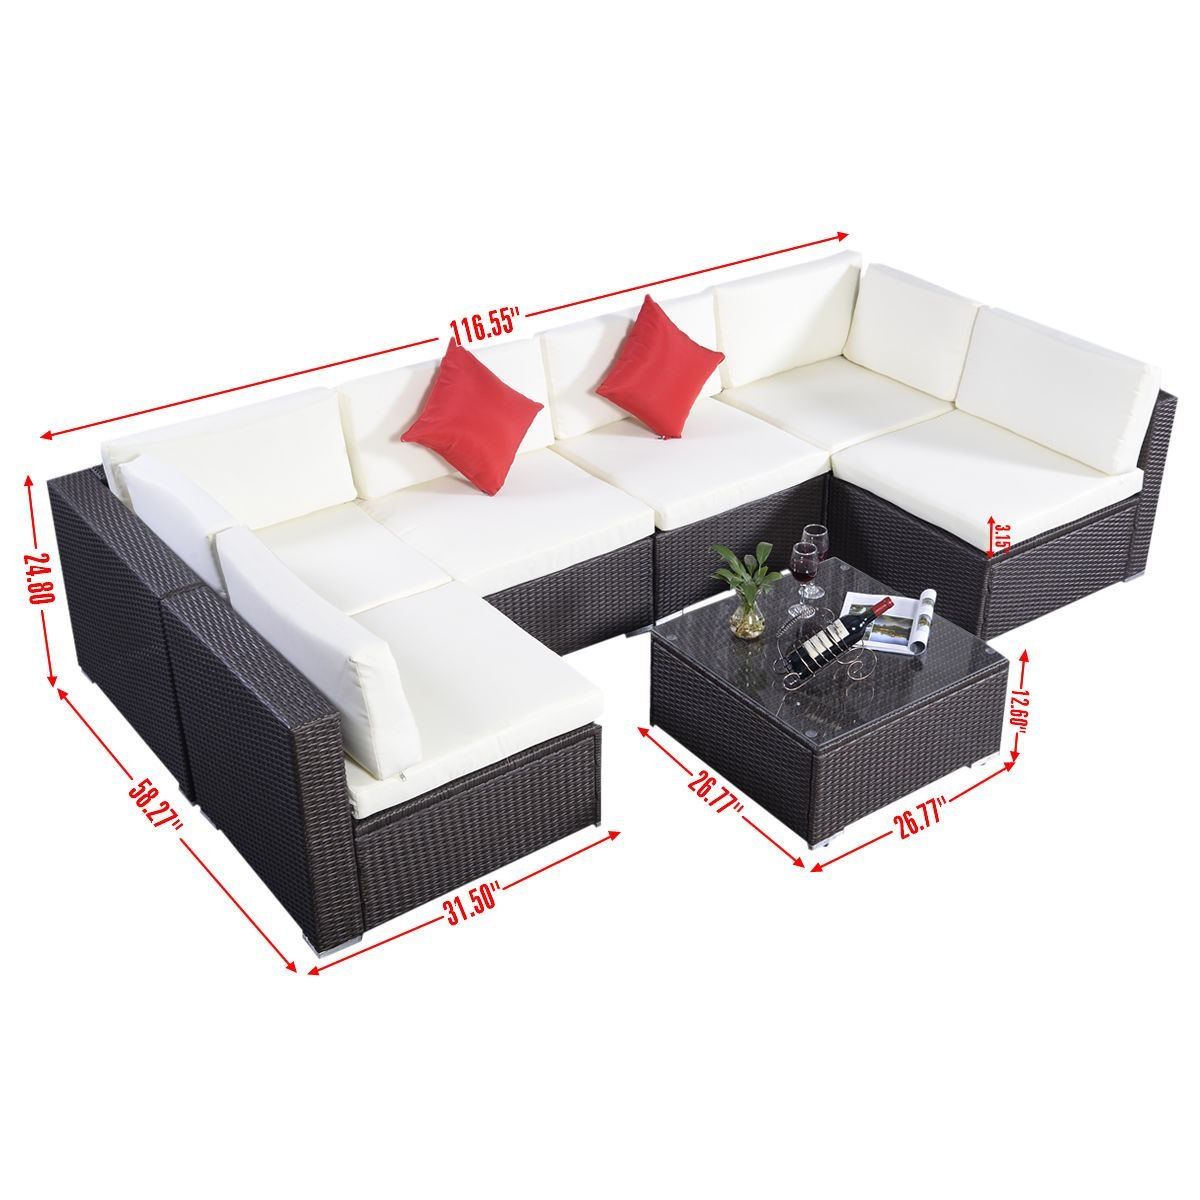 amazoncom giantex outdoor patio 7pc furniture sectional pe wicker rattan sofa set deck couch brown patio lawn u0026 garden - Sectional Patio Furniture